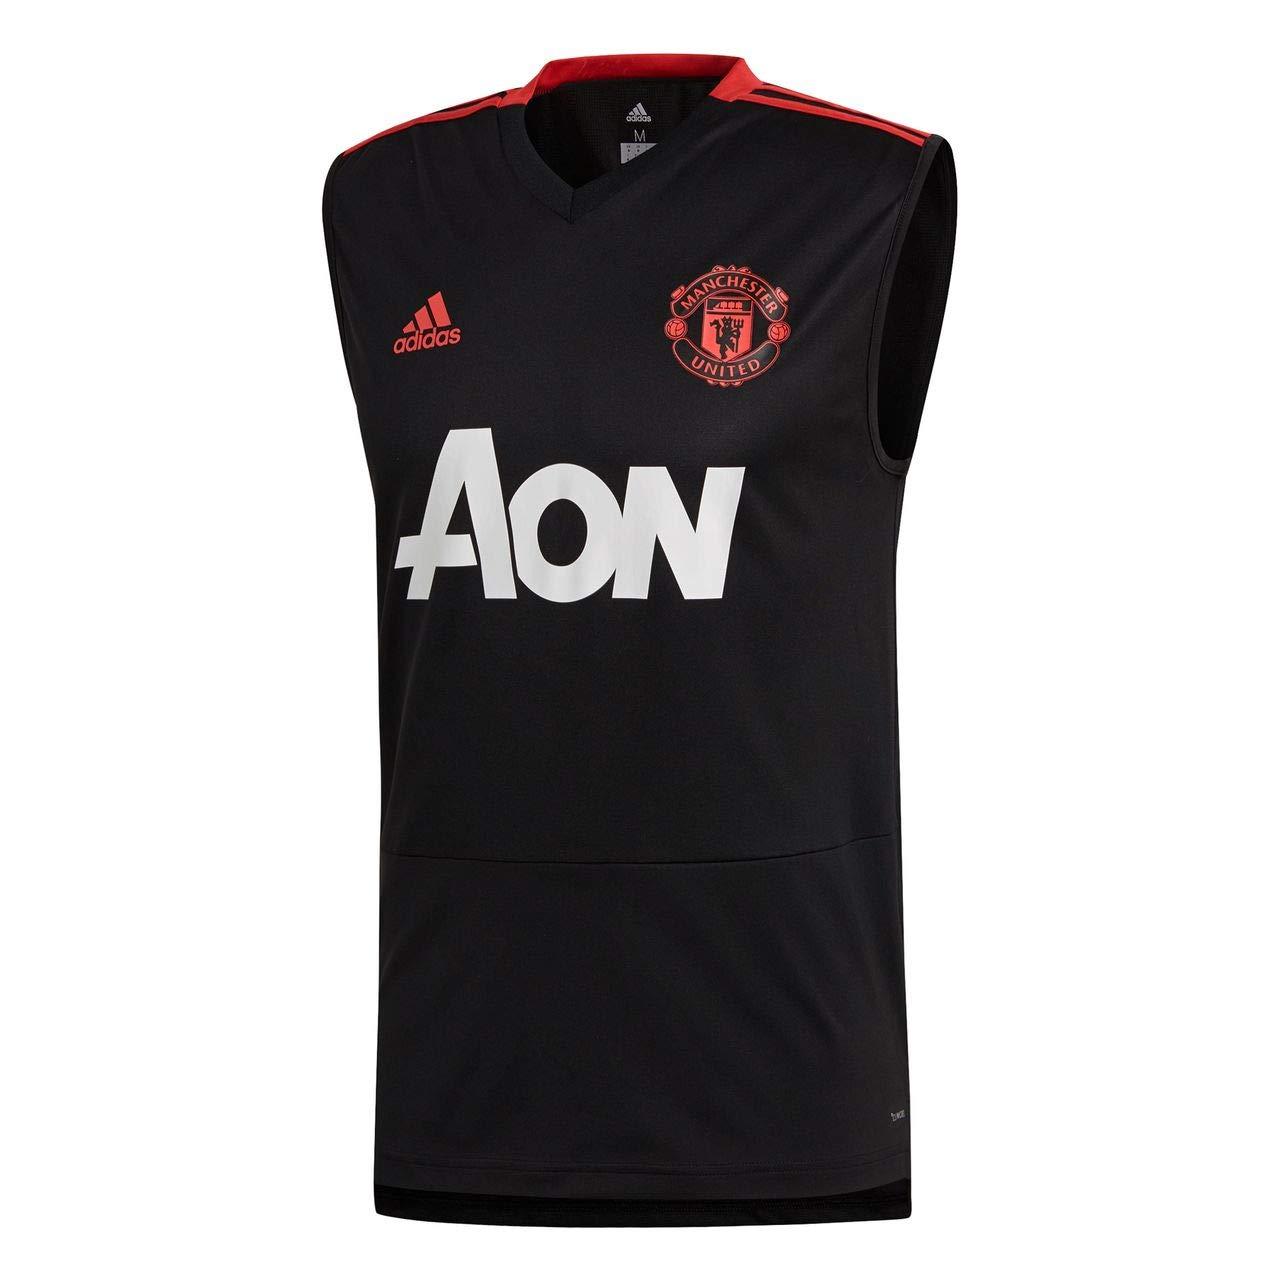 【2018最新作】 2018-2019 Small Man Utd Adidas 36-38